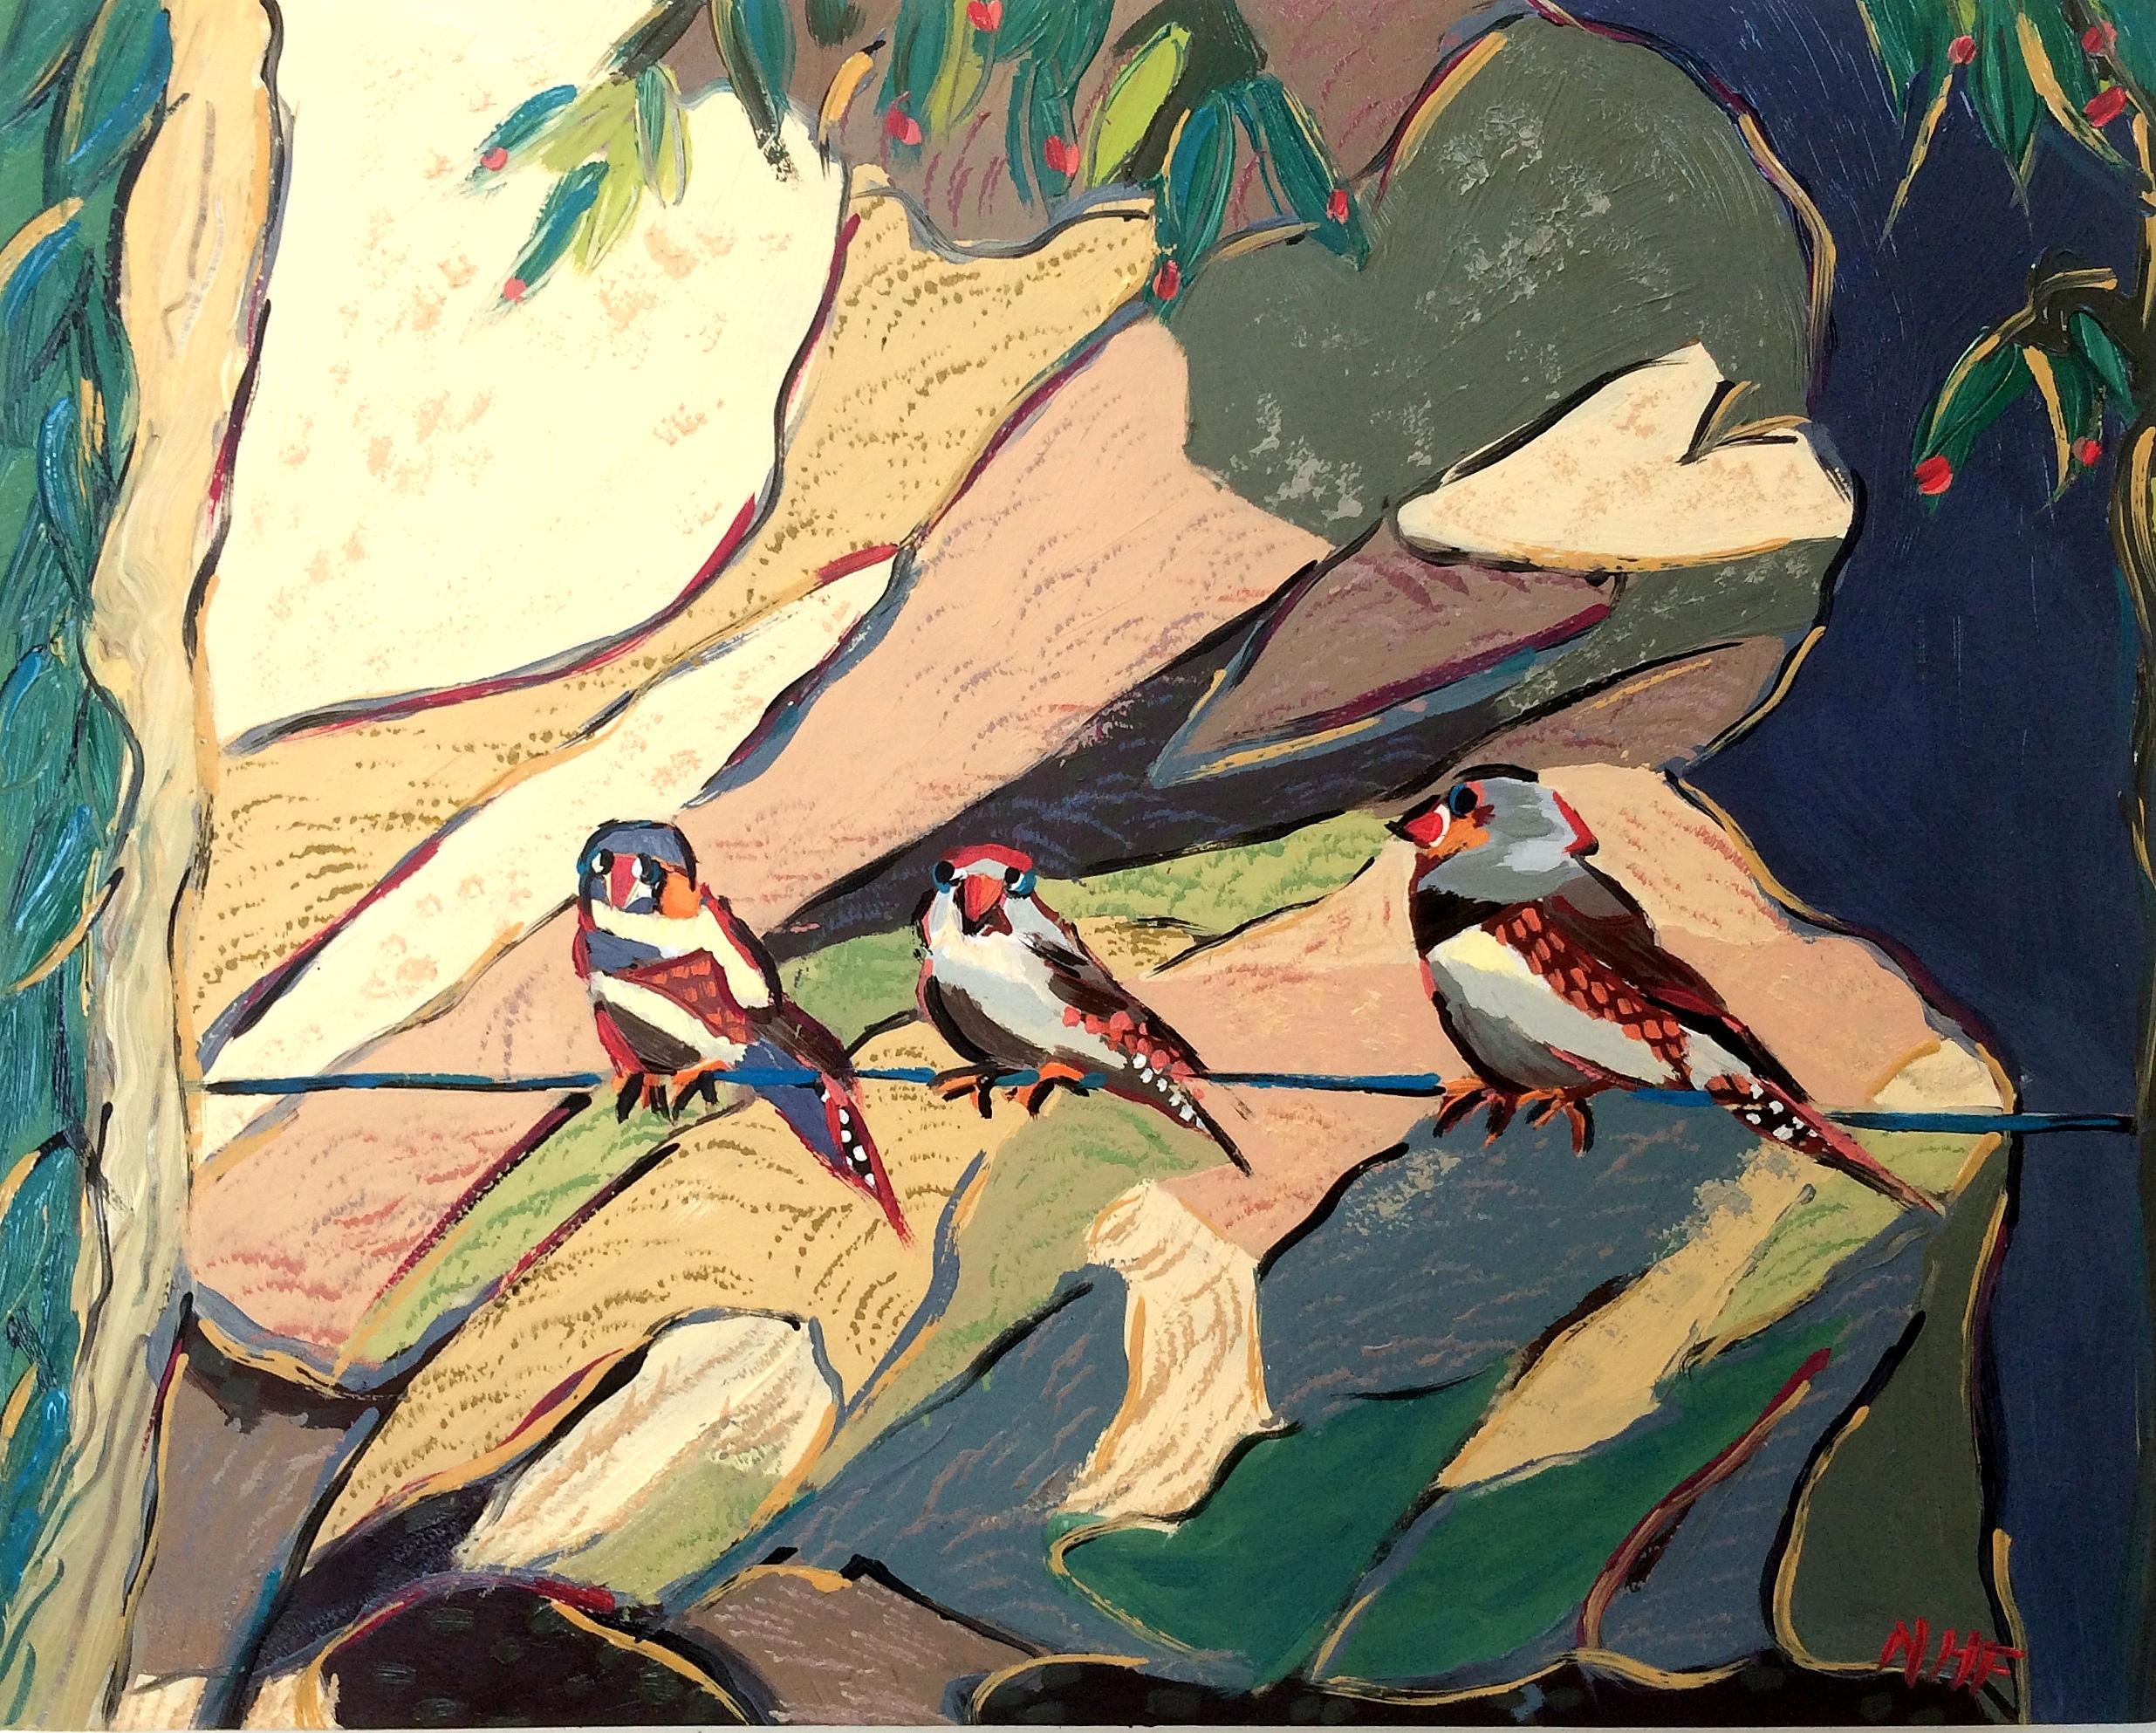 Birds Down Under 3 , Oil on panel, 8x10, $750